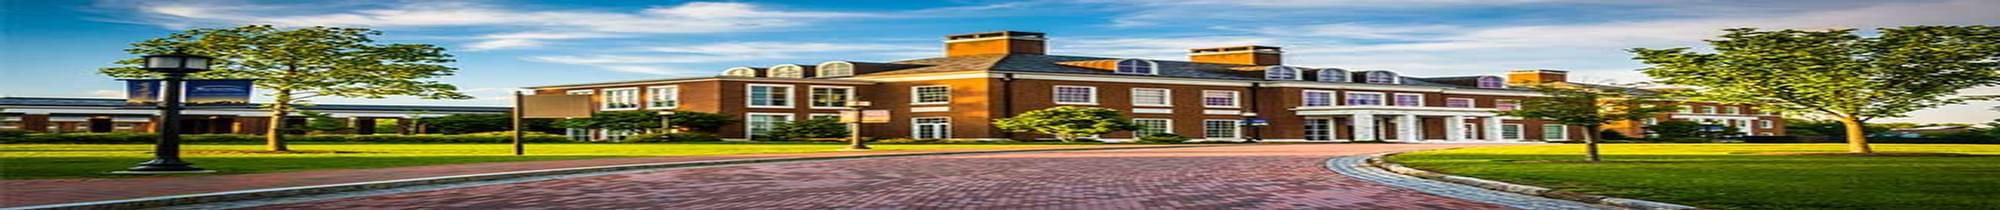 Jhu Academic Calendar 2022.Johns Hopkins University Jhu Baltimore Admission Criteria Application Deadlines 2021